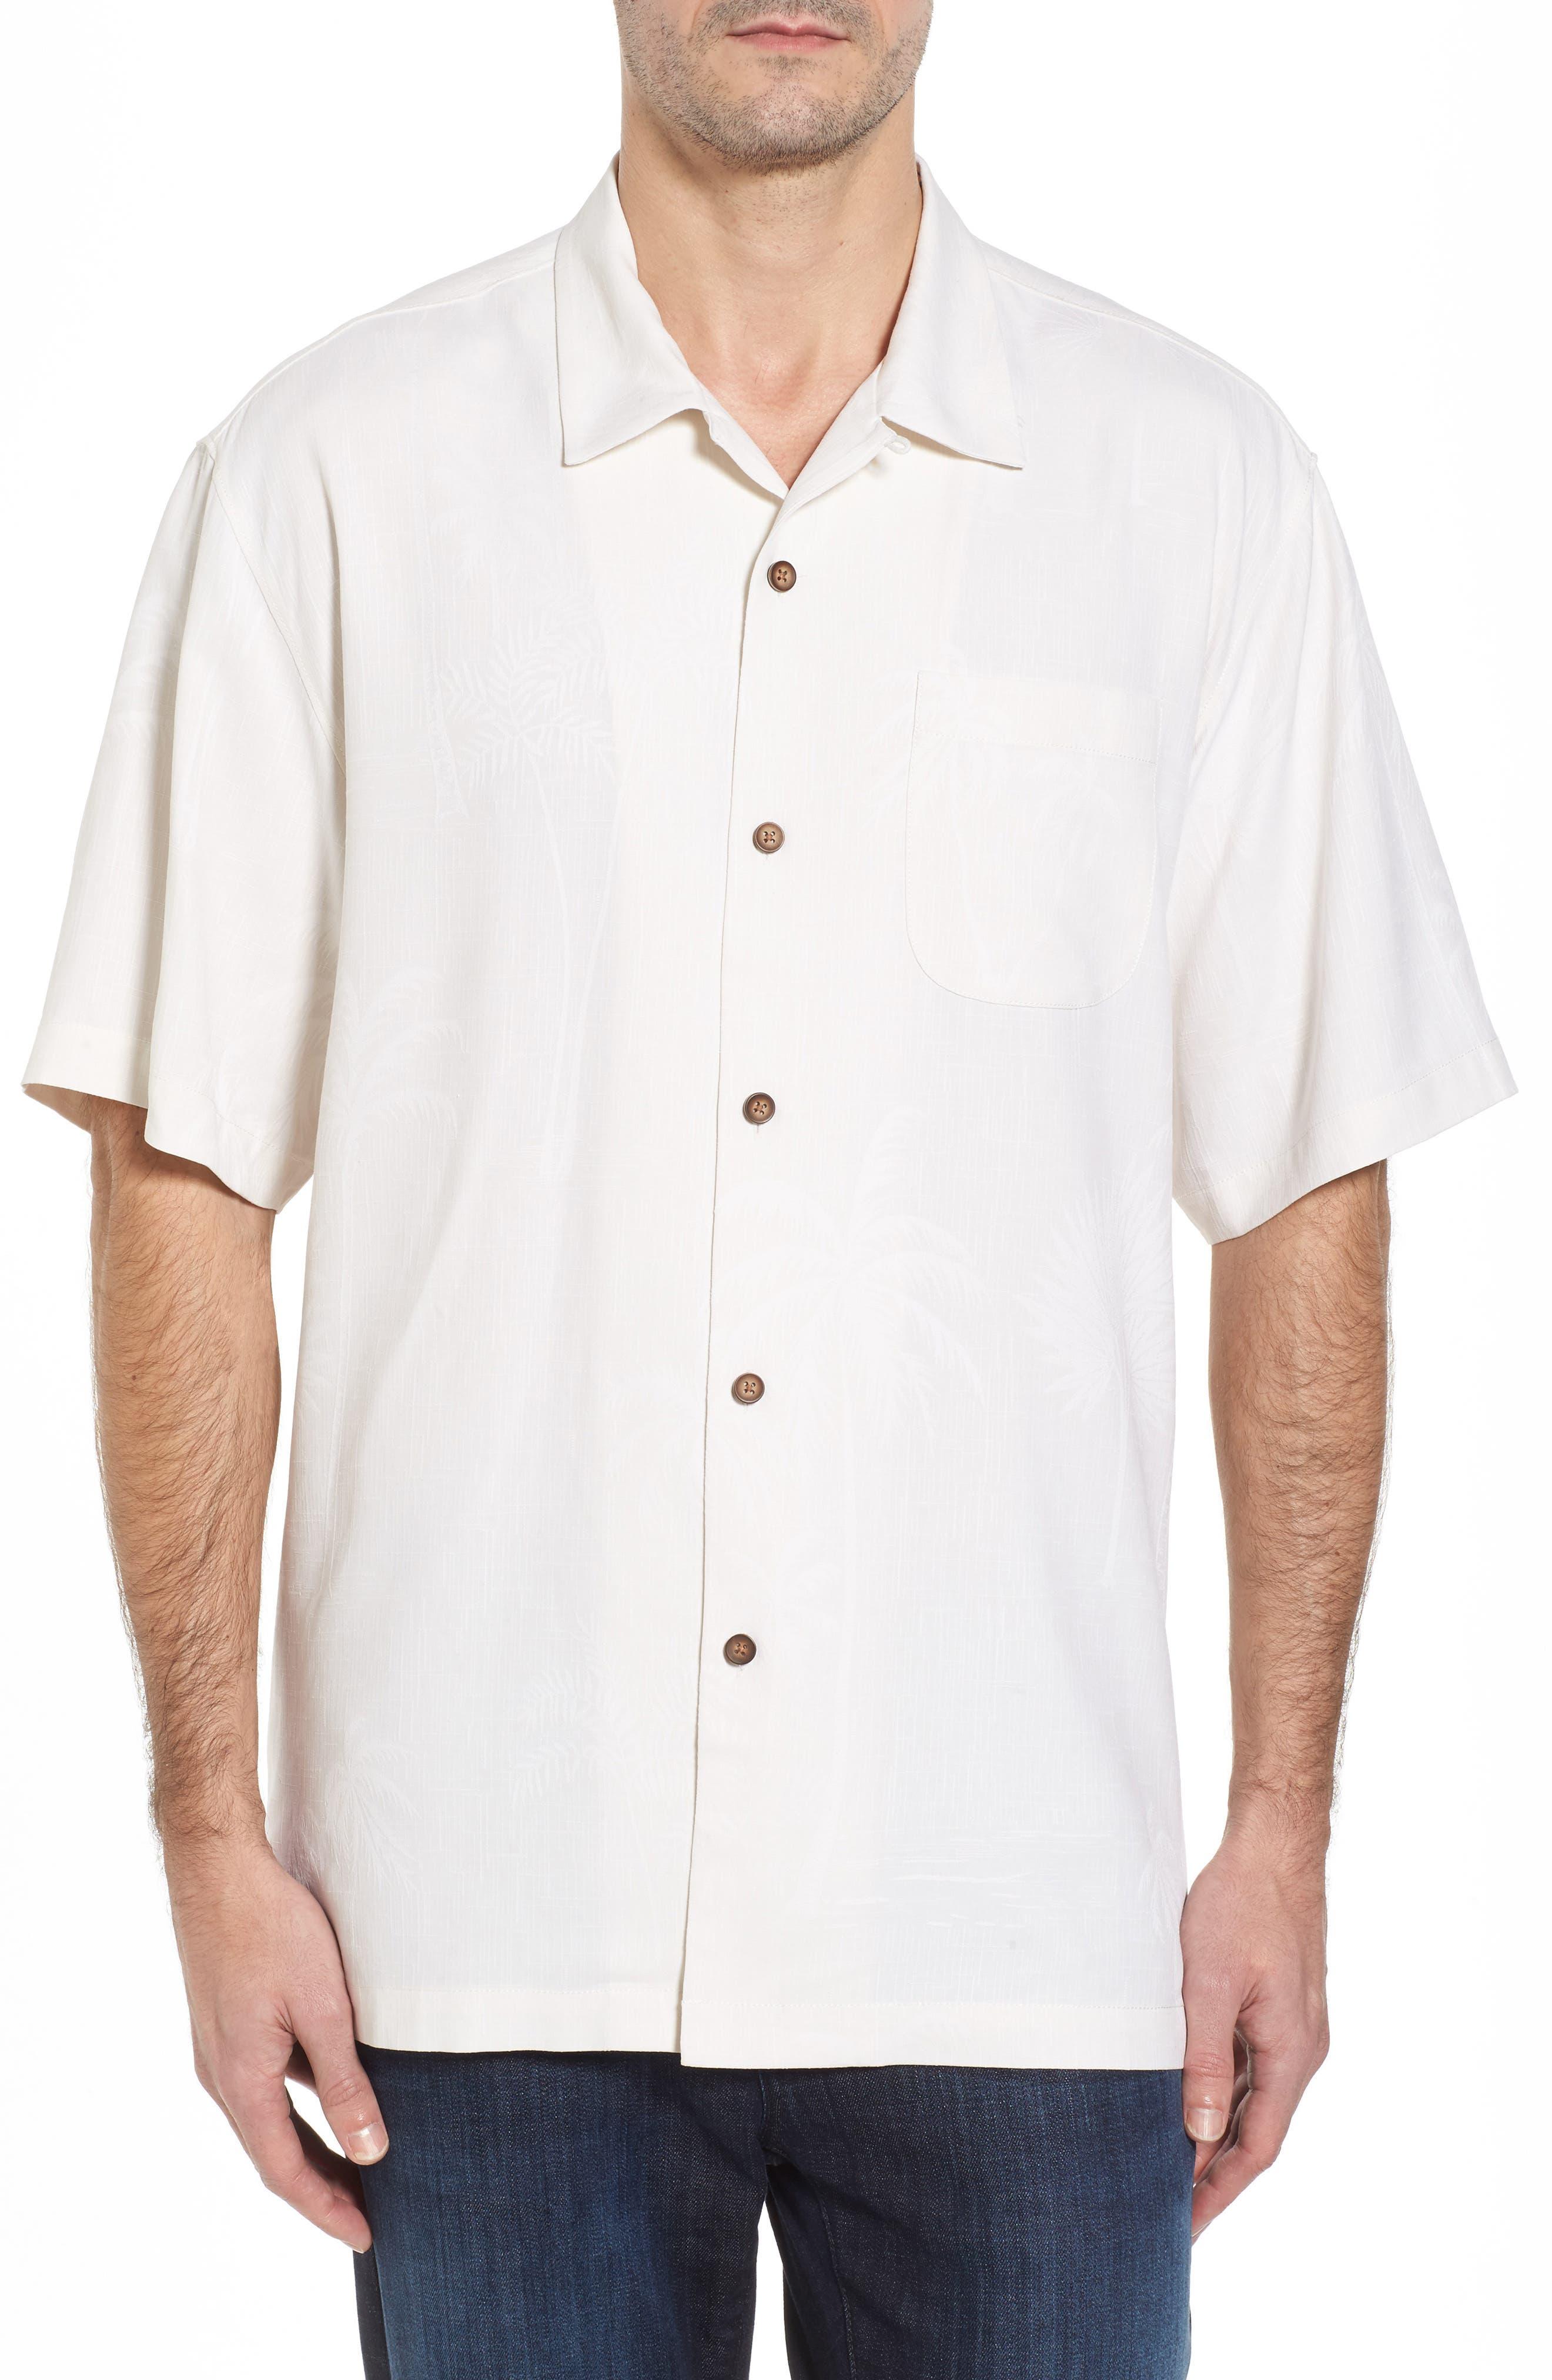 Main Image - Tommy Bahama Offshore Sails Silk Camp Shirt